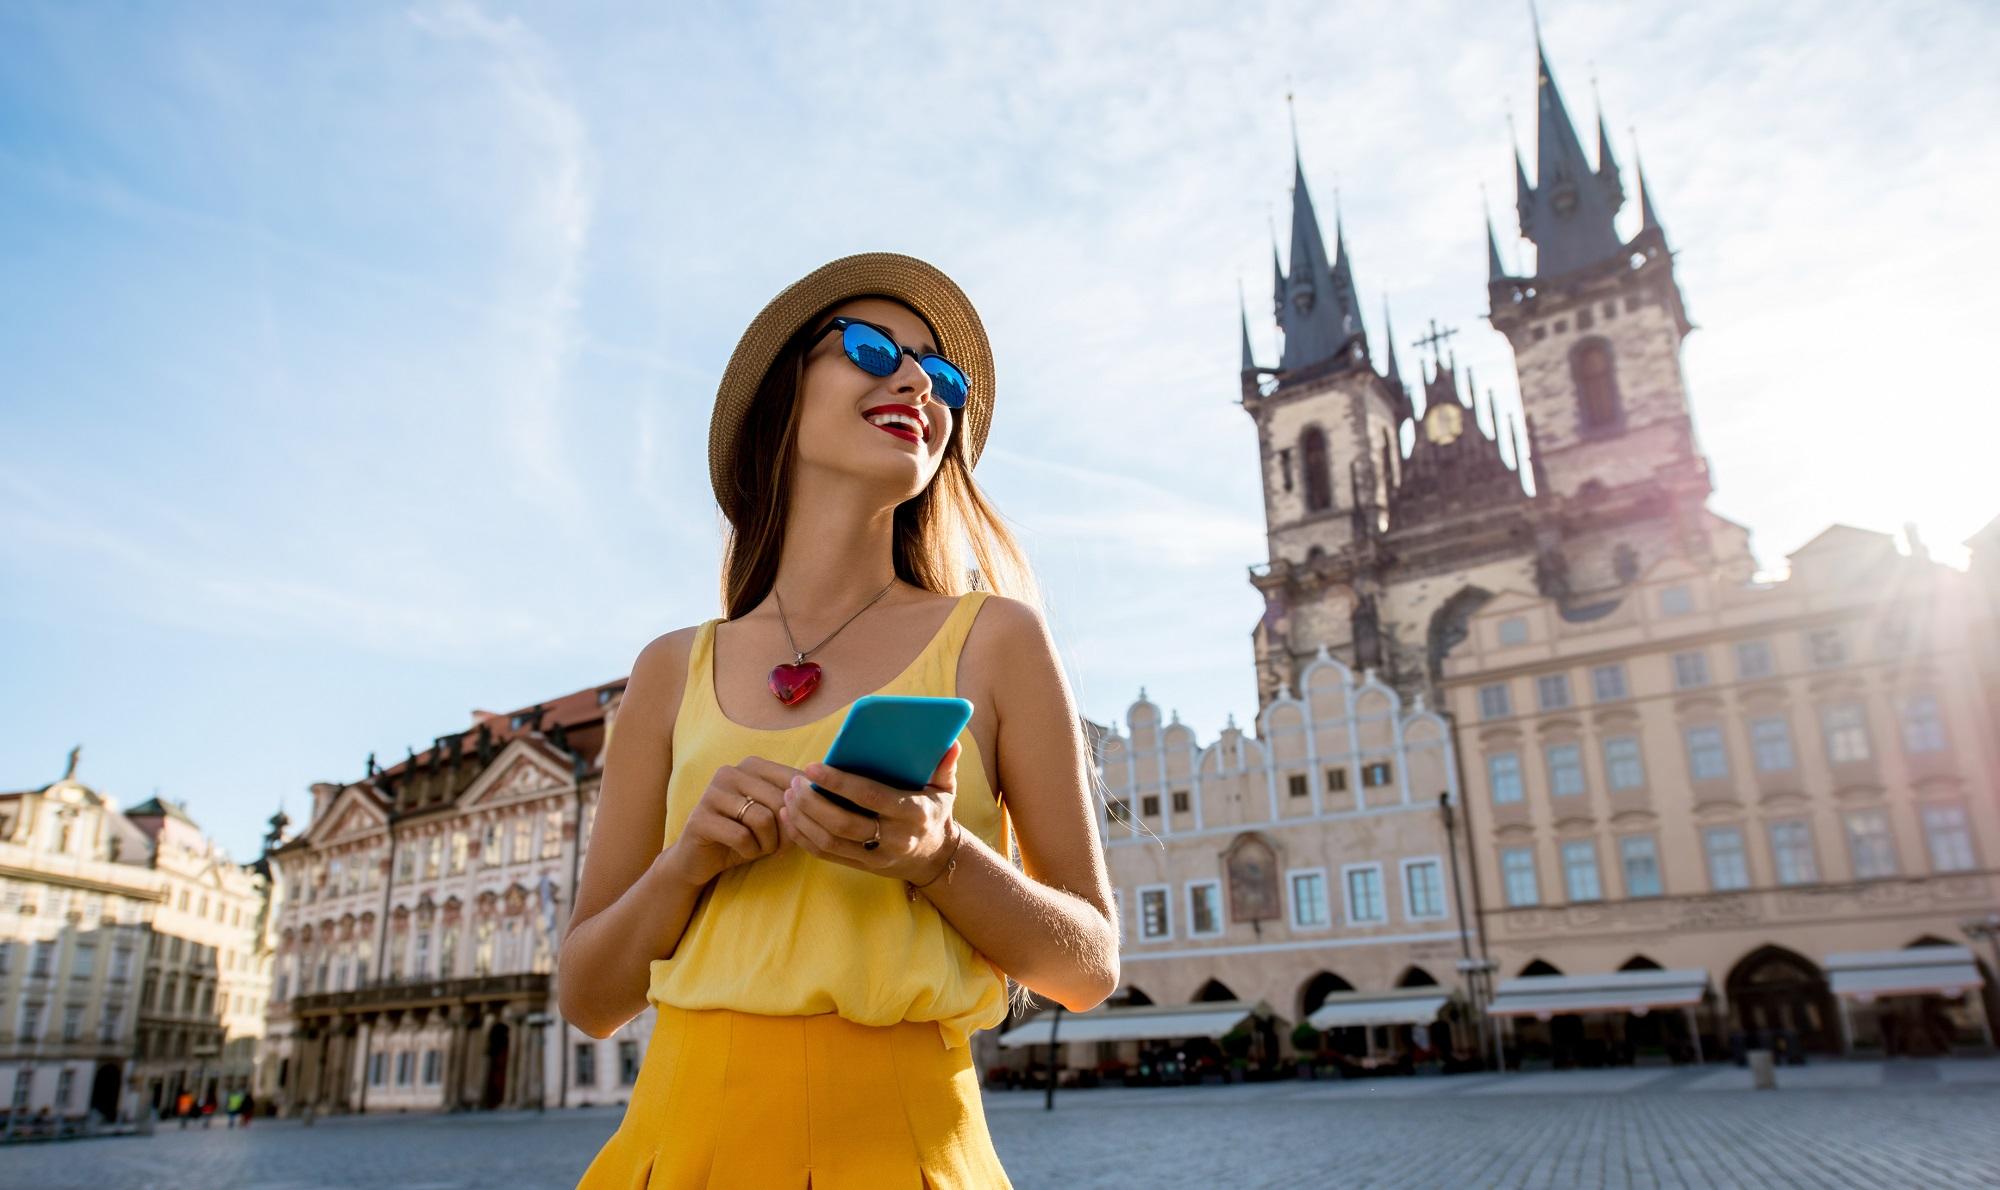 image-turisticka-aplikace